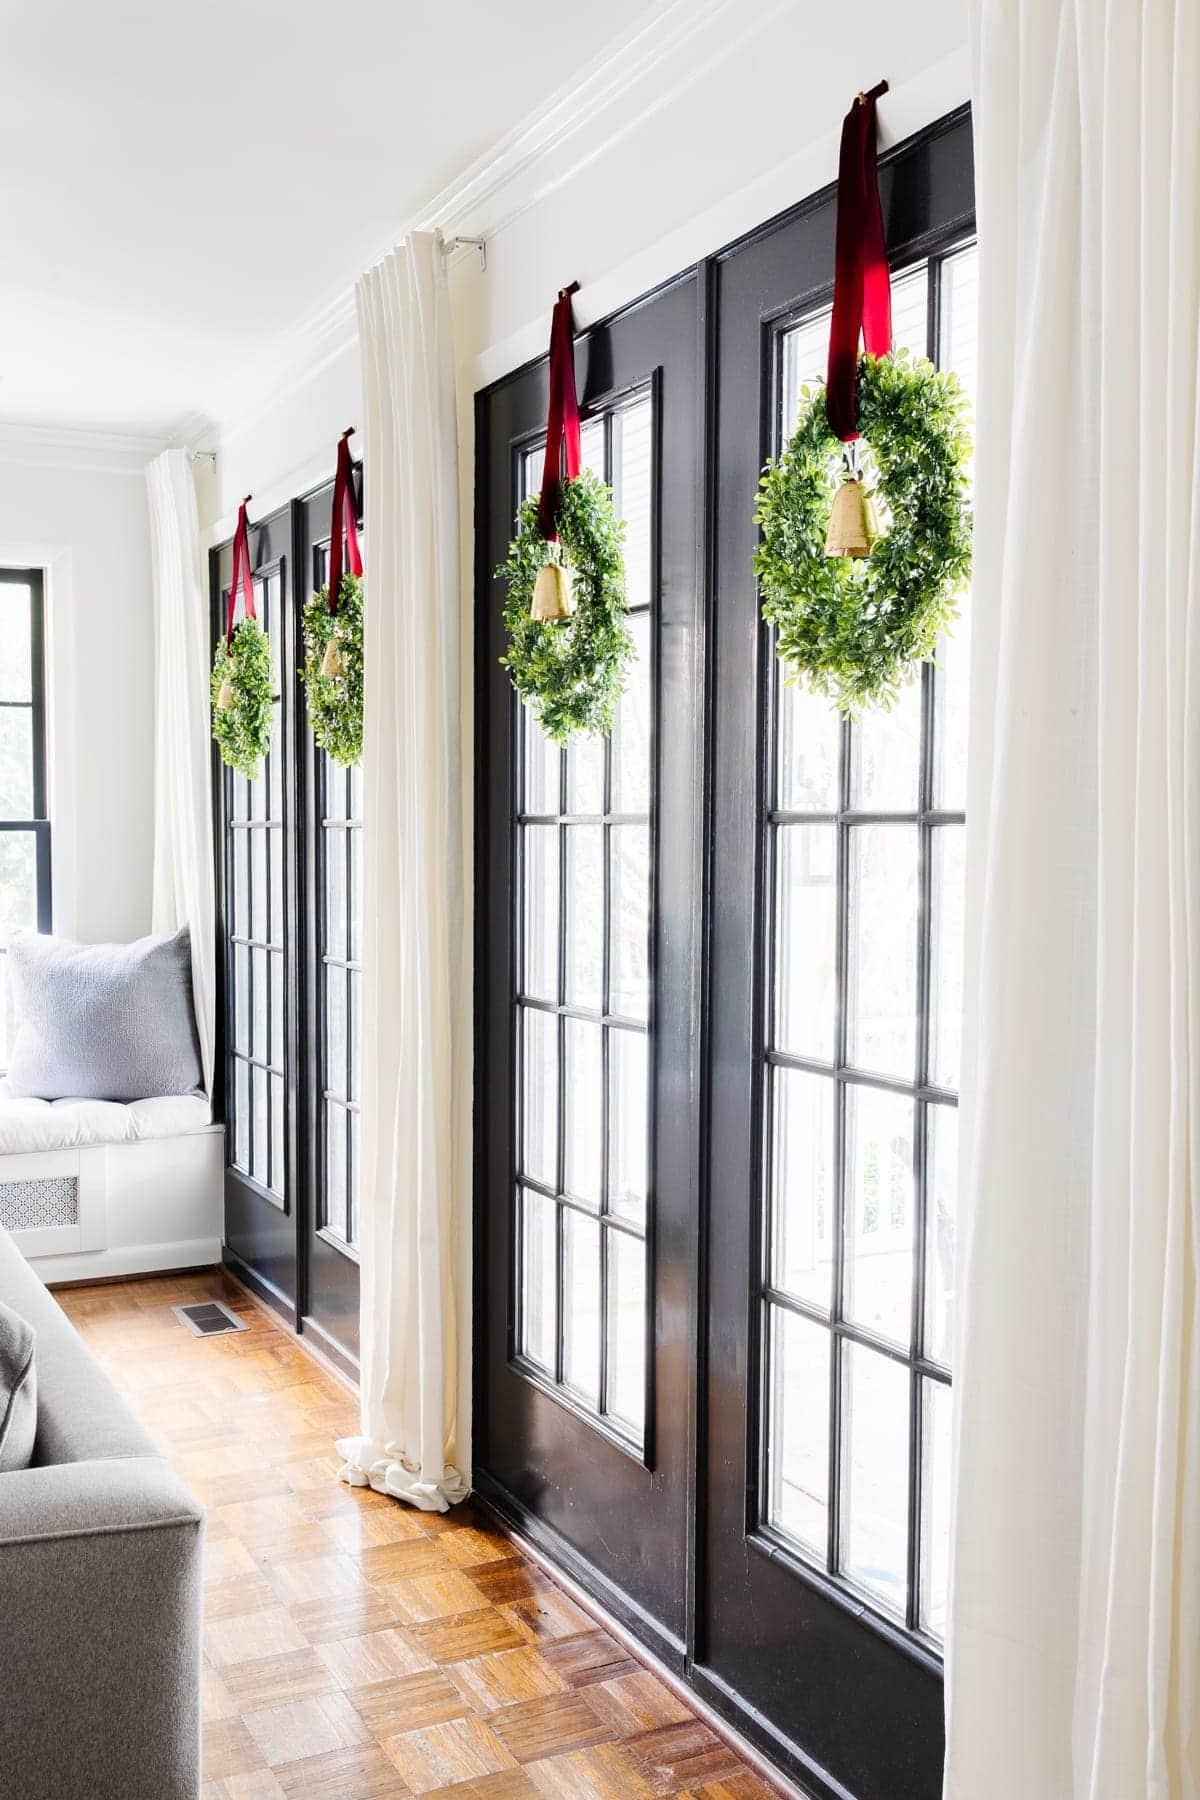 Crédulas de Natal penduradas nas janelas das portas francesas